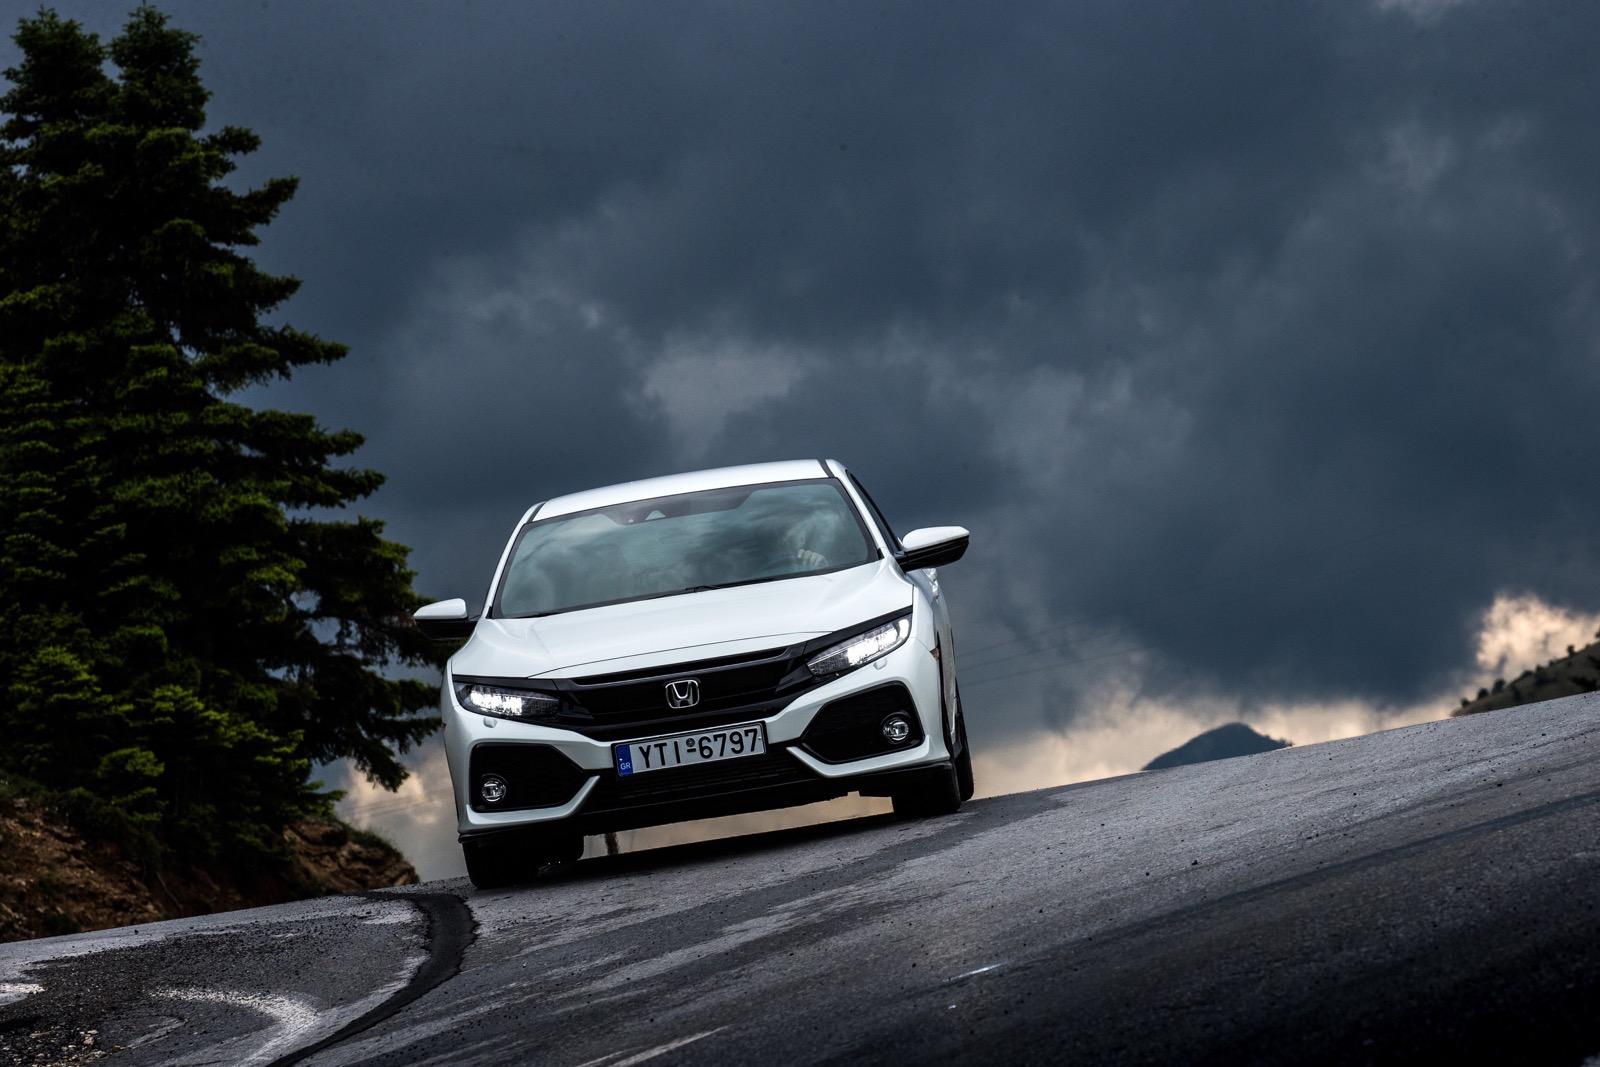 New_Honda_Civic_First_Drive_156